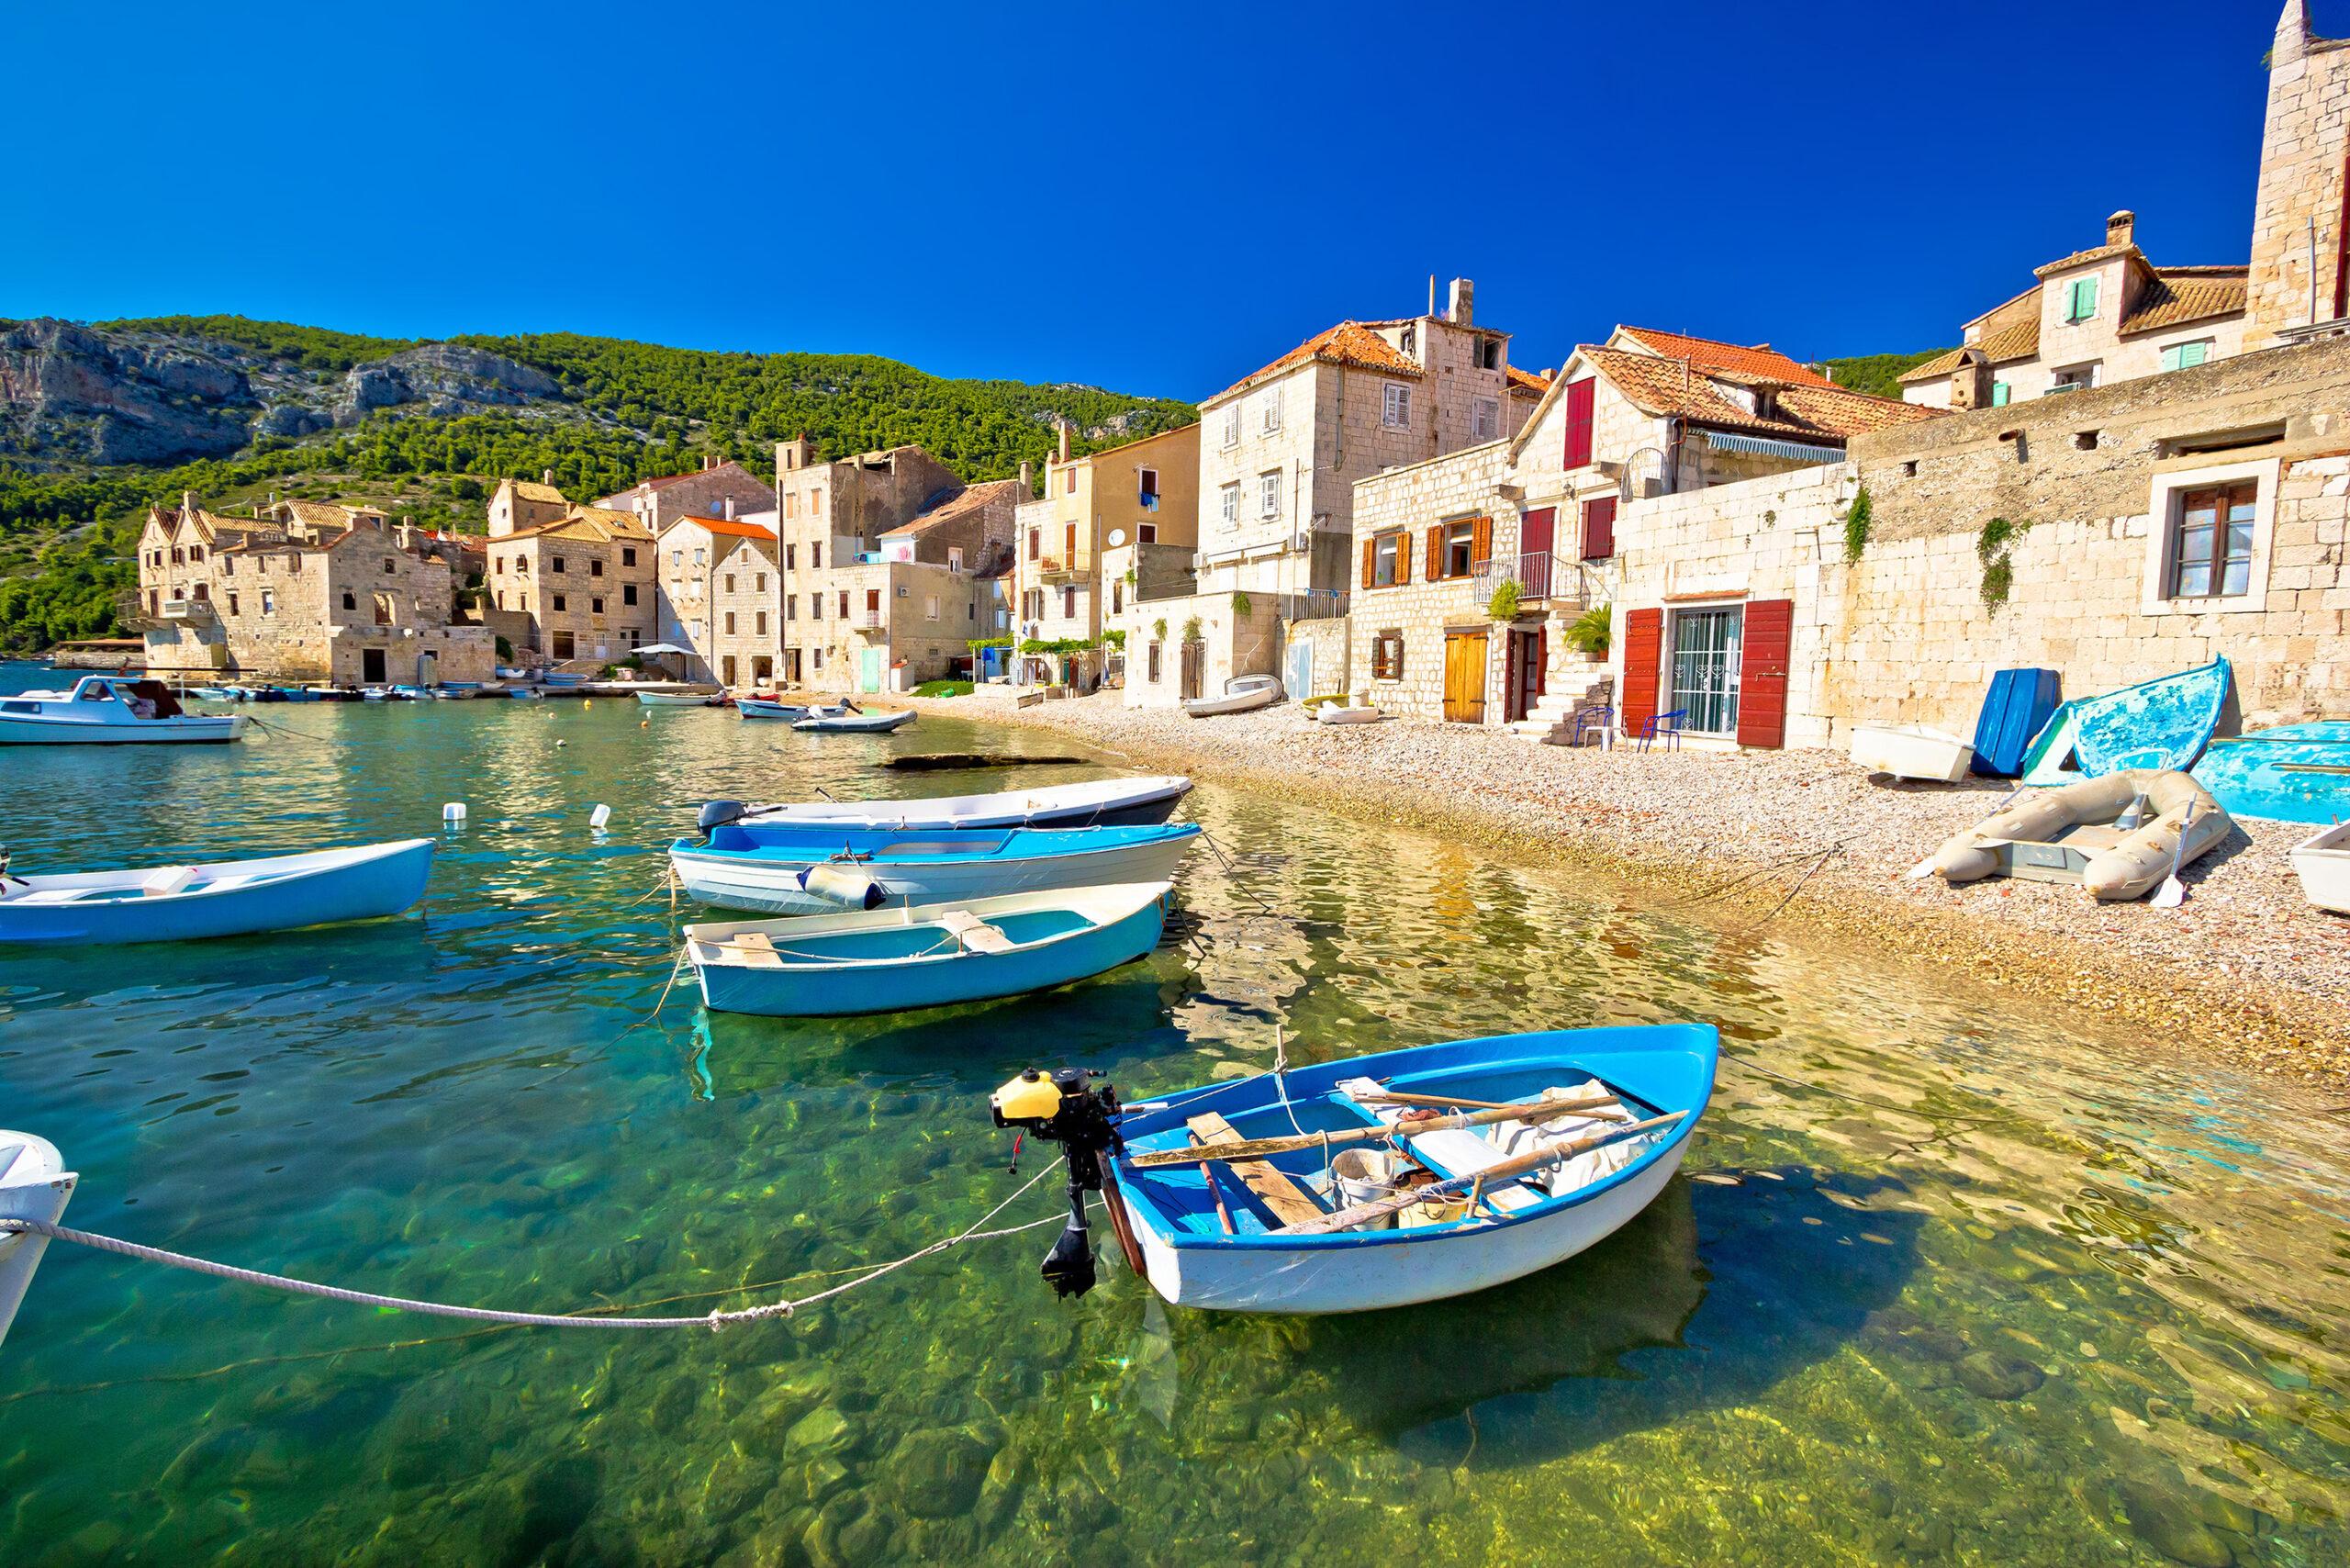 Scenic beach in Komiza village waterfront, Island of Vis, Croatia